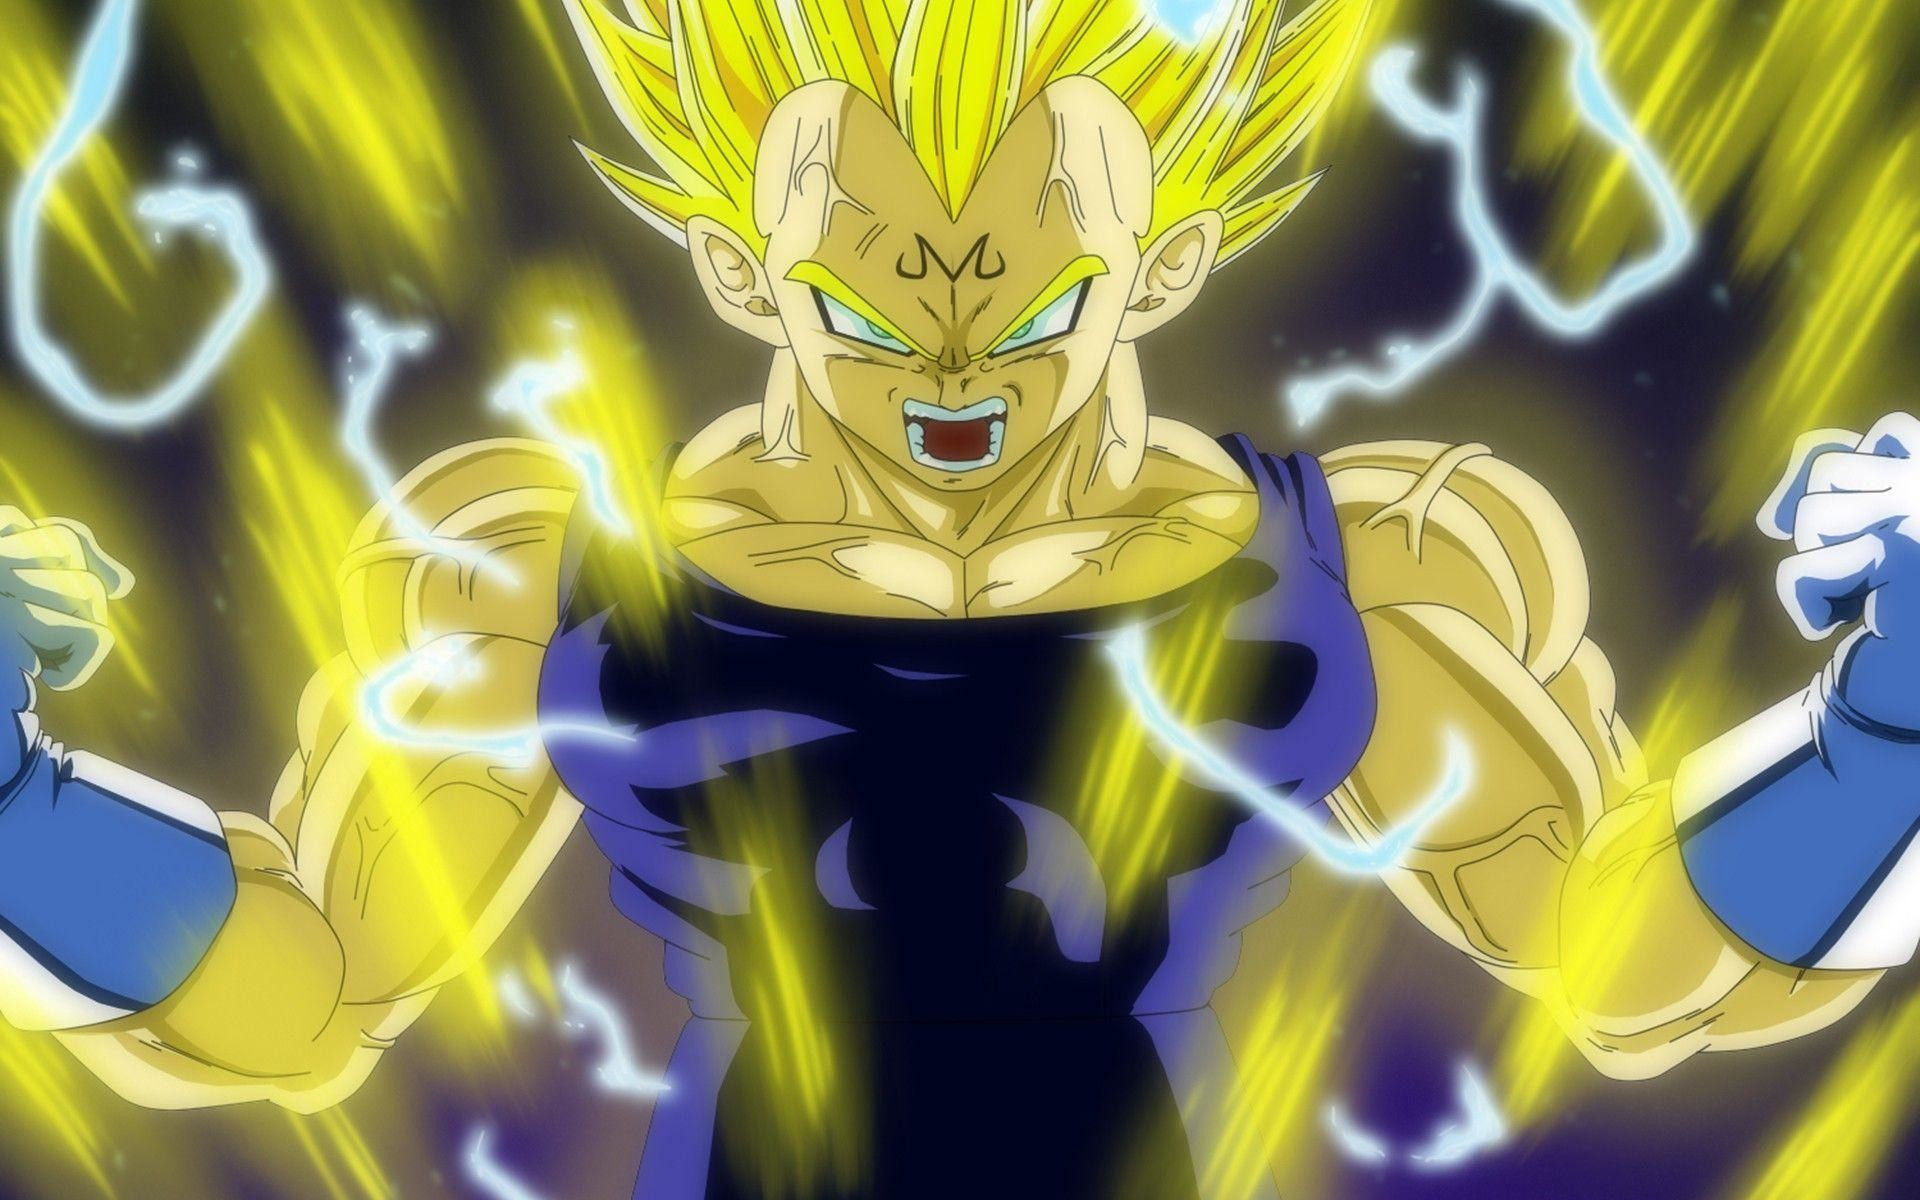 Dragon Ball Z Pictures Of Majin Vegeta